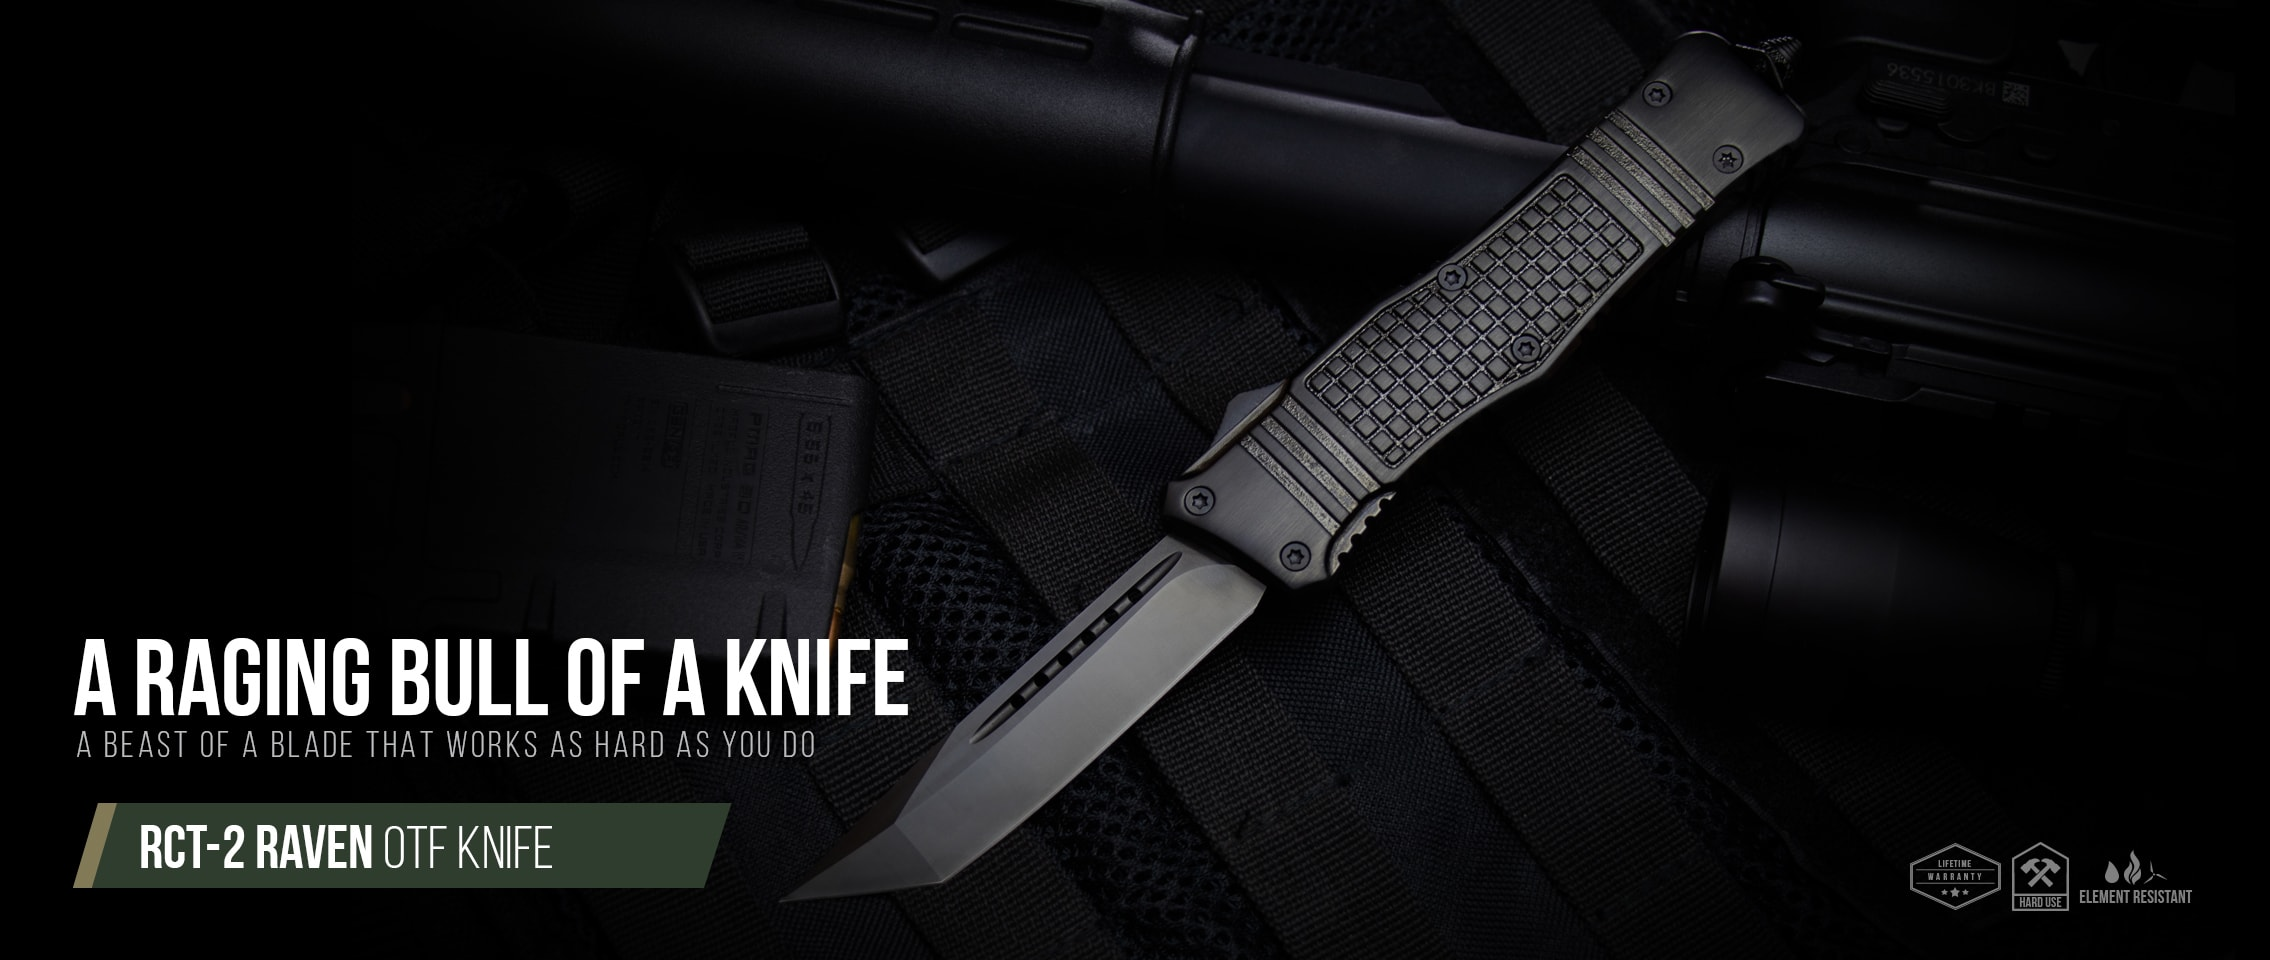 RCT-2 Raven OTF Knife